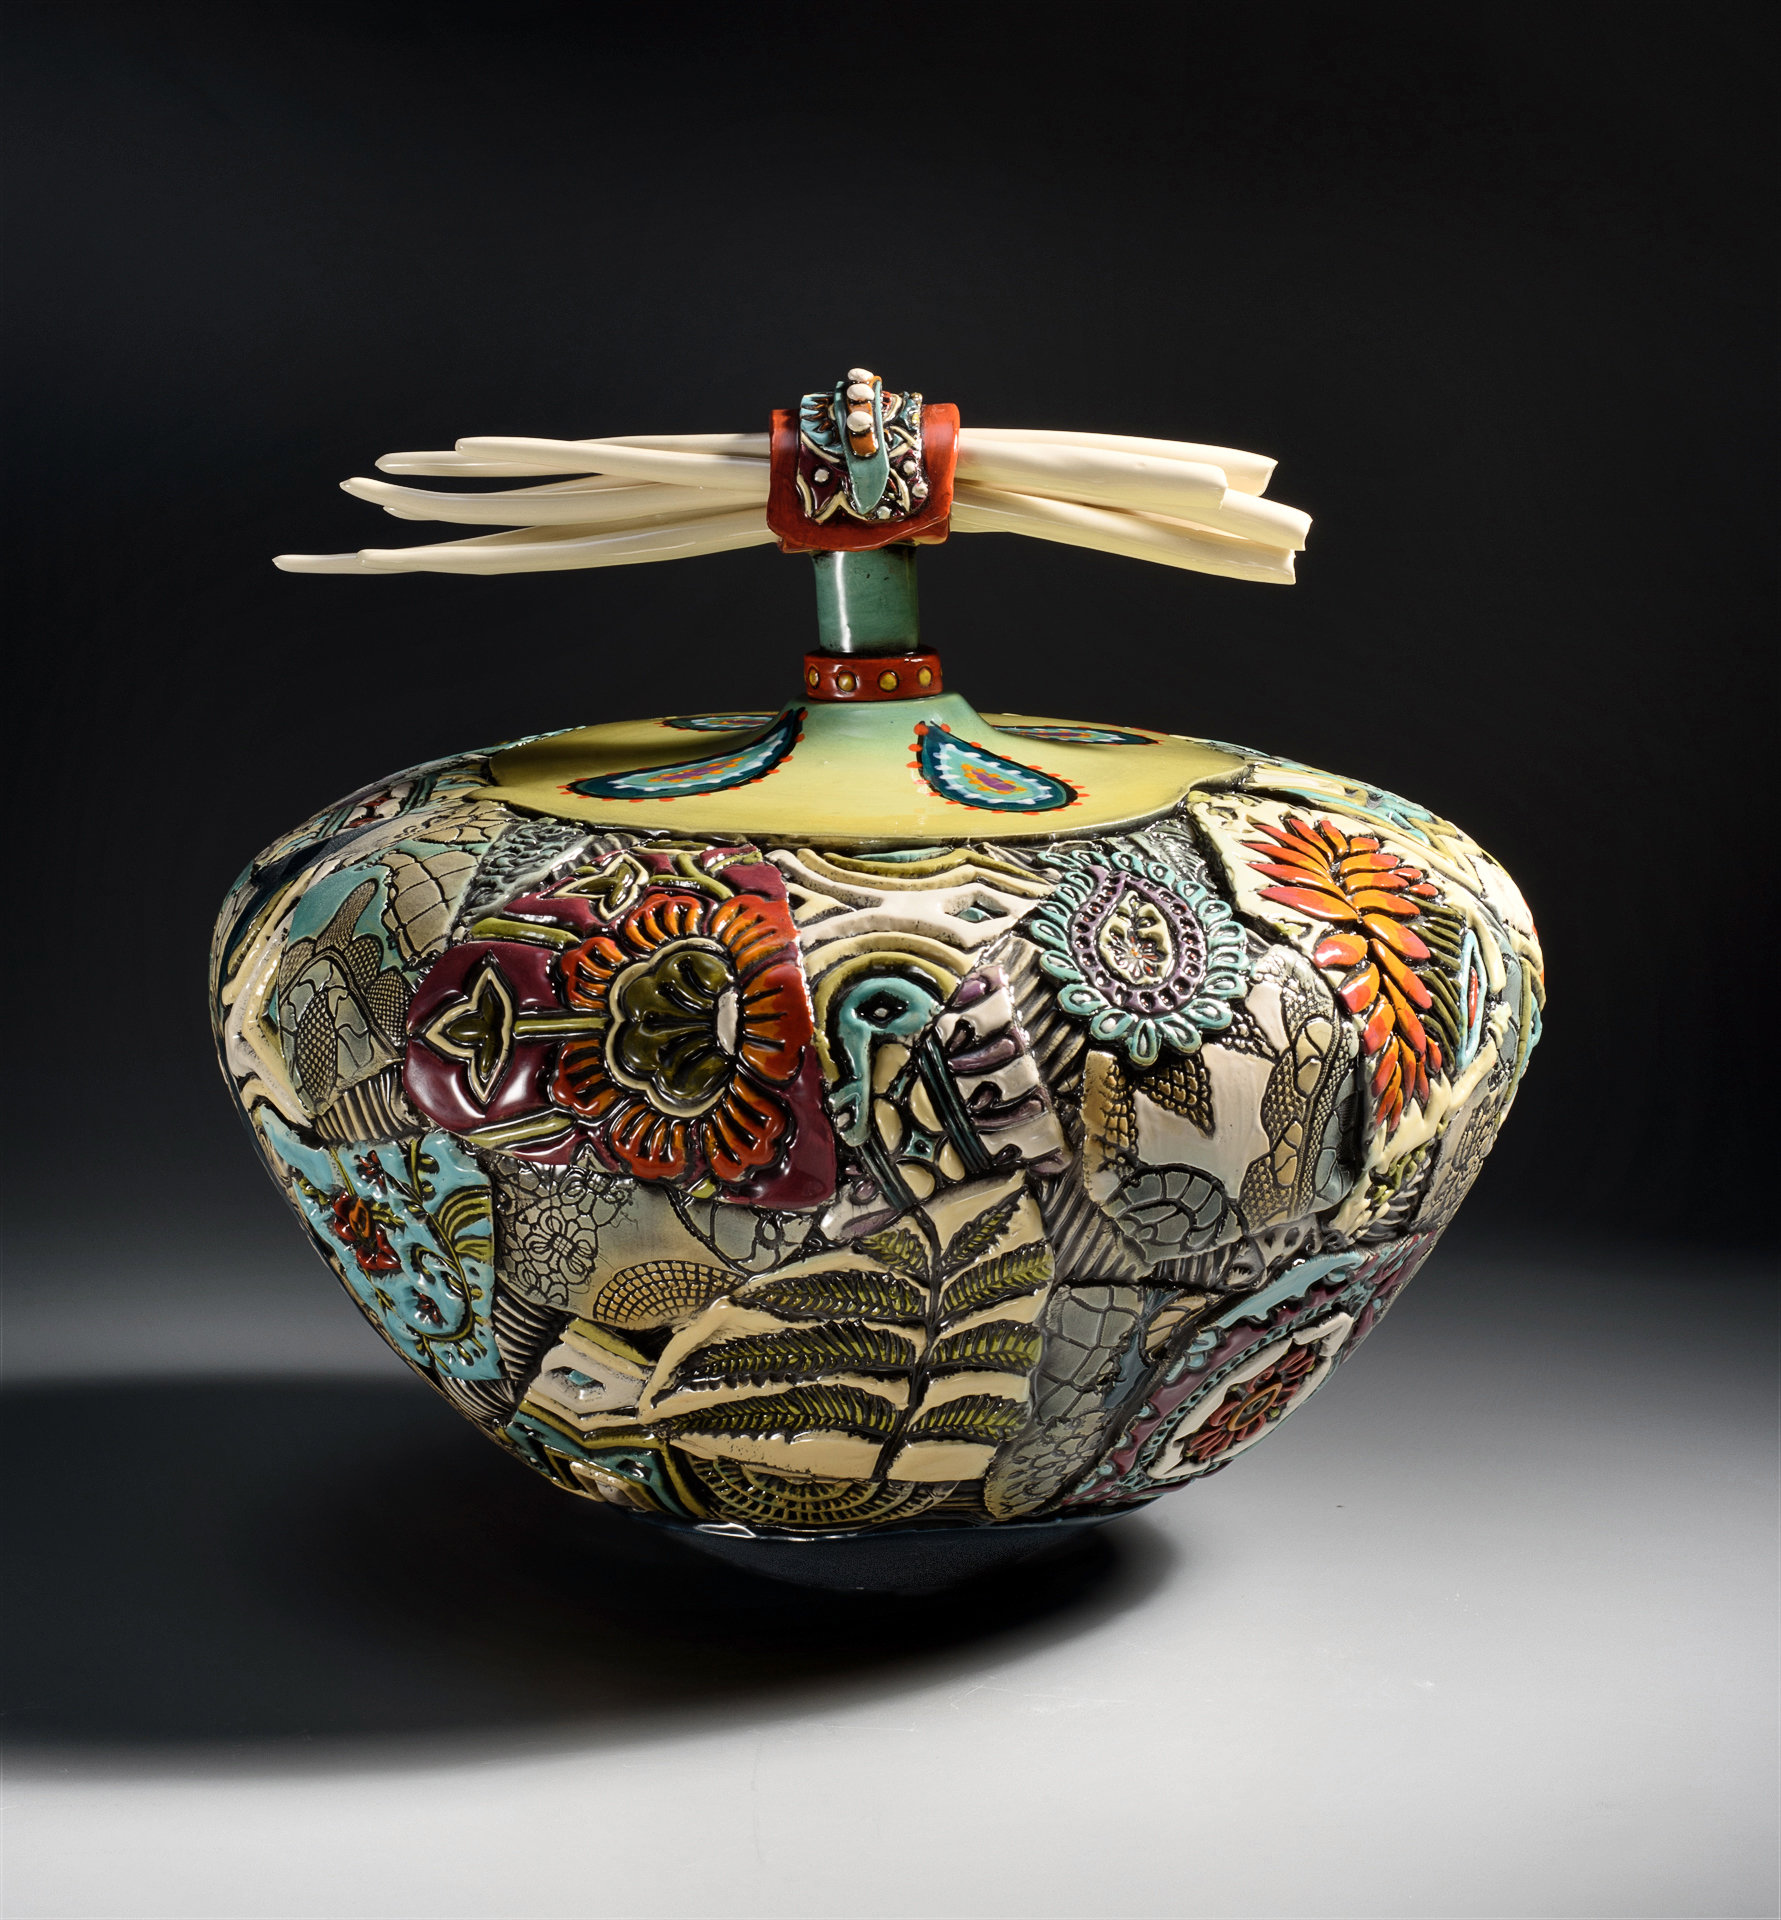 Extra Large Vessel With Porcelain Bones By Gail Markiewicz Ceramic Vessel Artful Home Ceramic Urn Ceramic Vessel Porcelain Jewelry